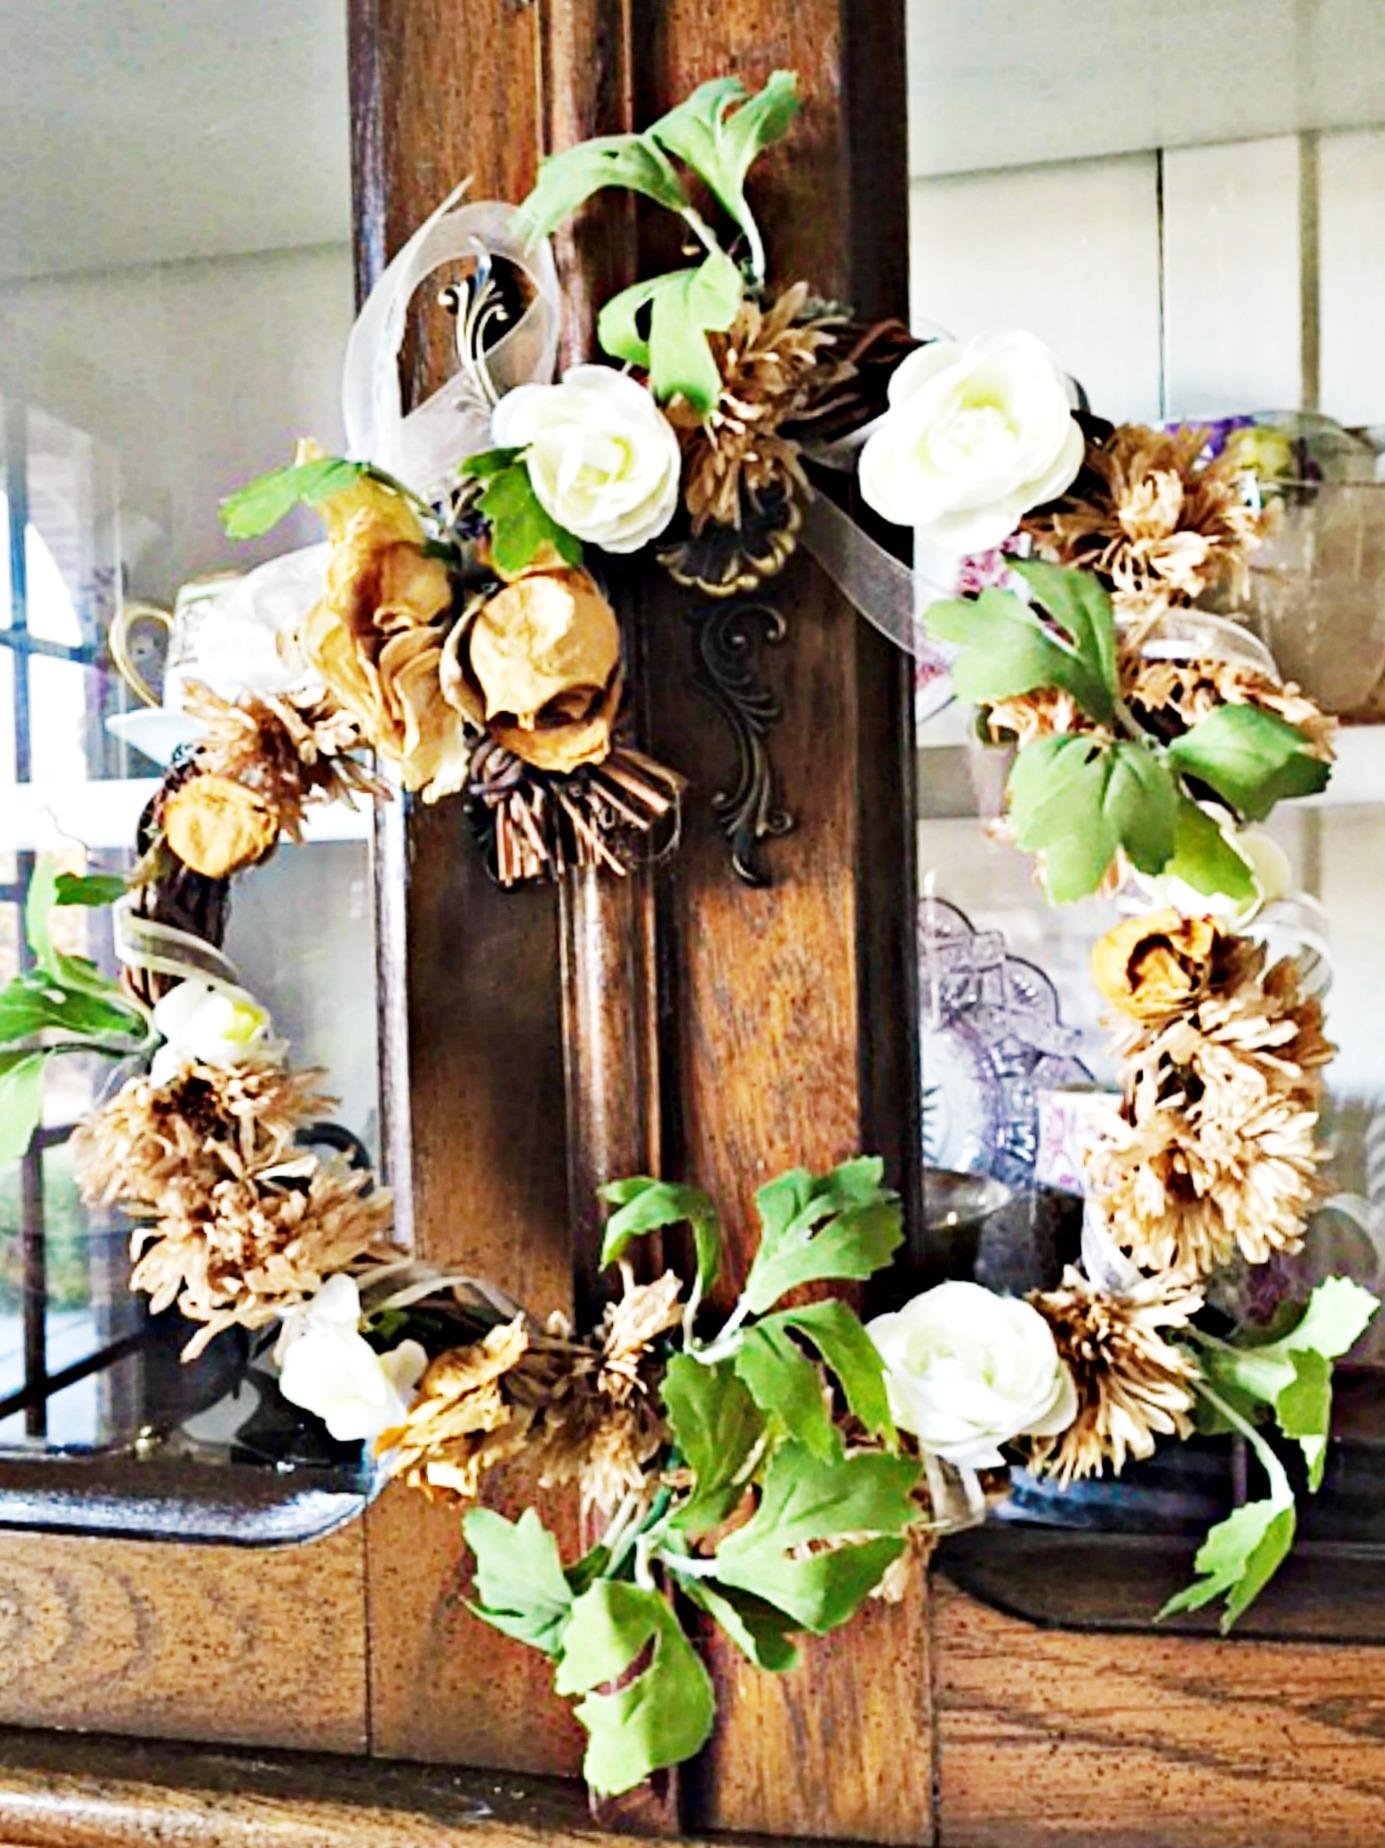 homemaking-decorating-decor-simplicity-athomewithjemma